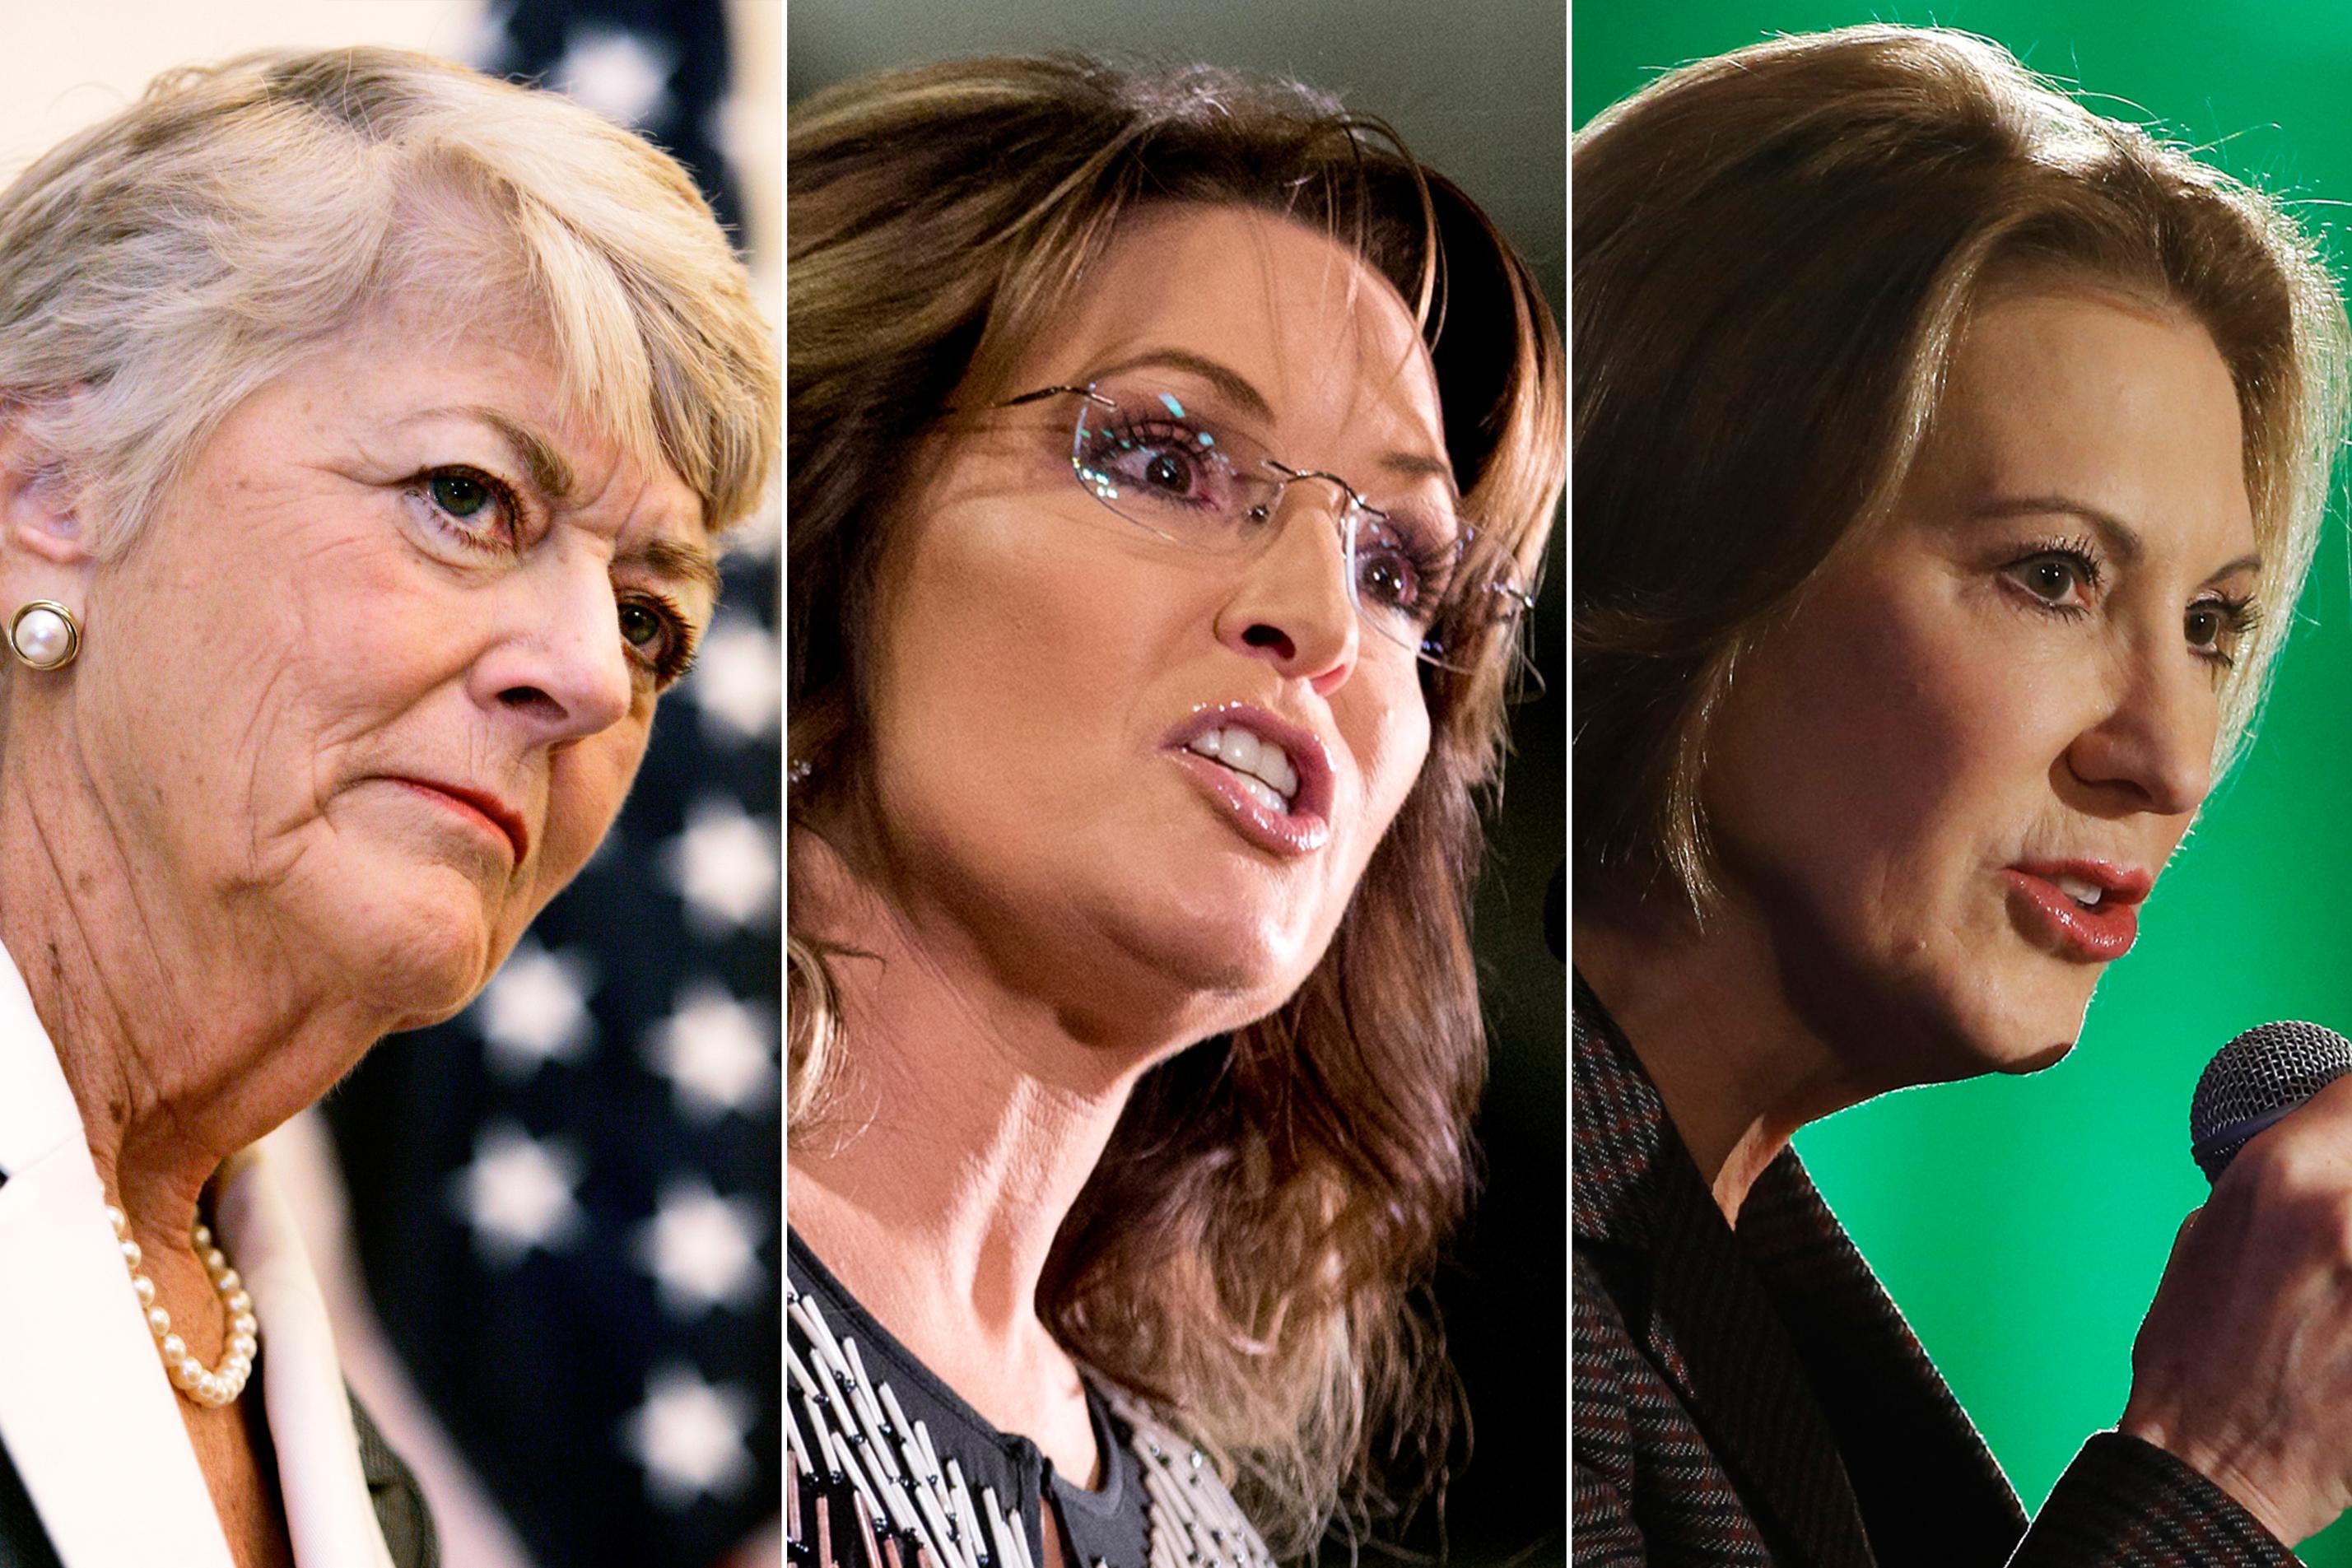 Geraldine Ferraro in Chicago, on May 4, 2007 (L); Sarah Palin in Ames, Iowa on Jan. 19, 2016 (C); Carly Fiorina in Nashua, NH on Jan. 23, 2016.